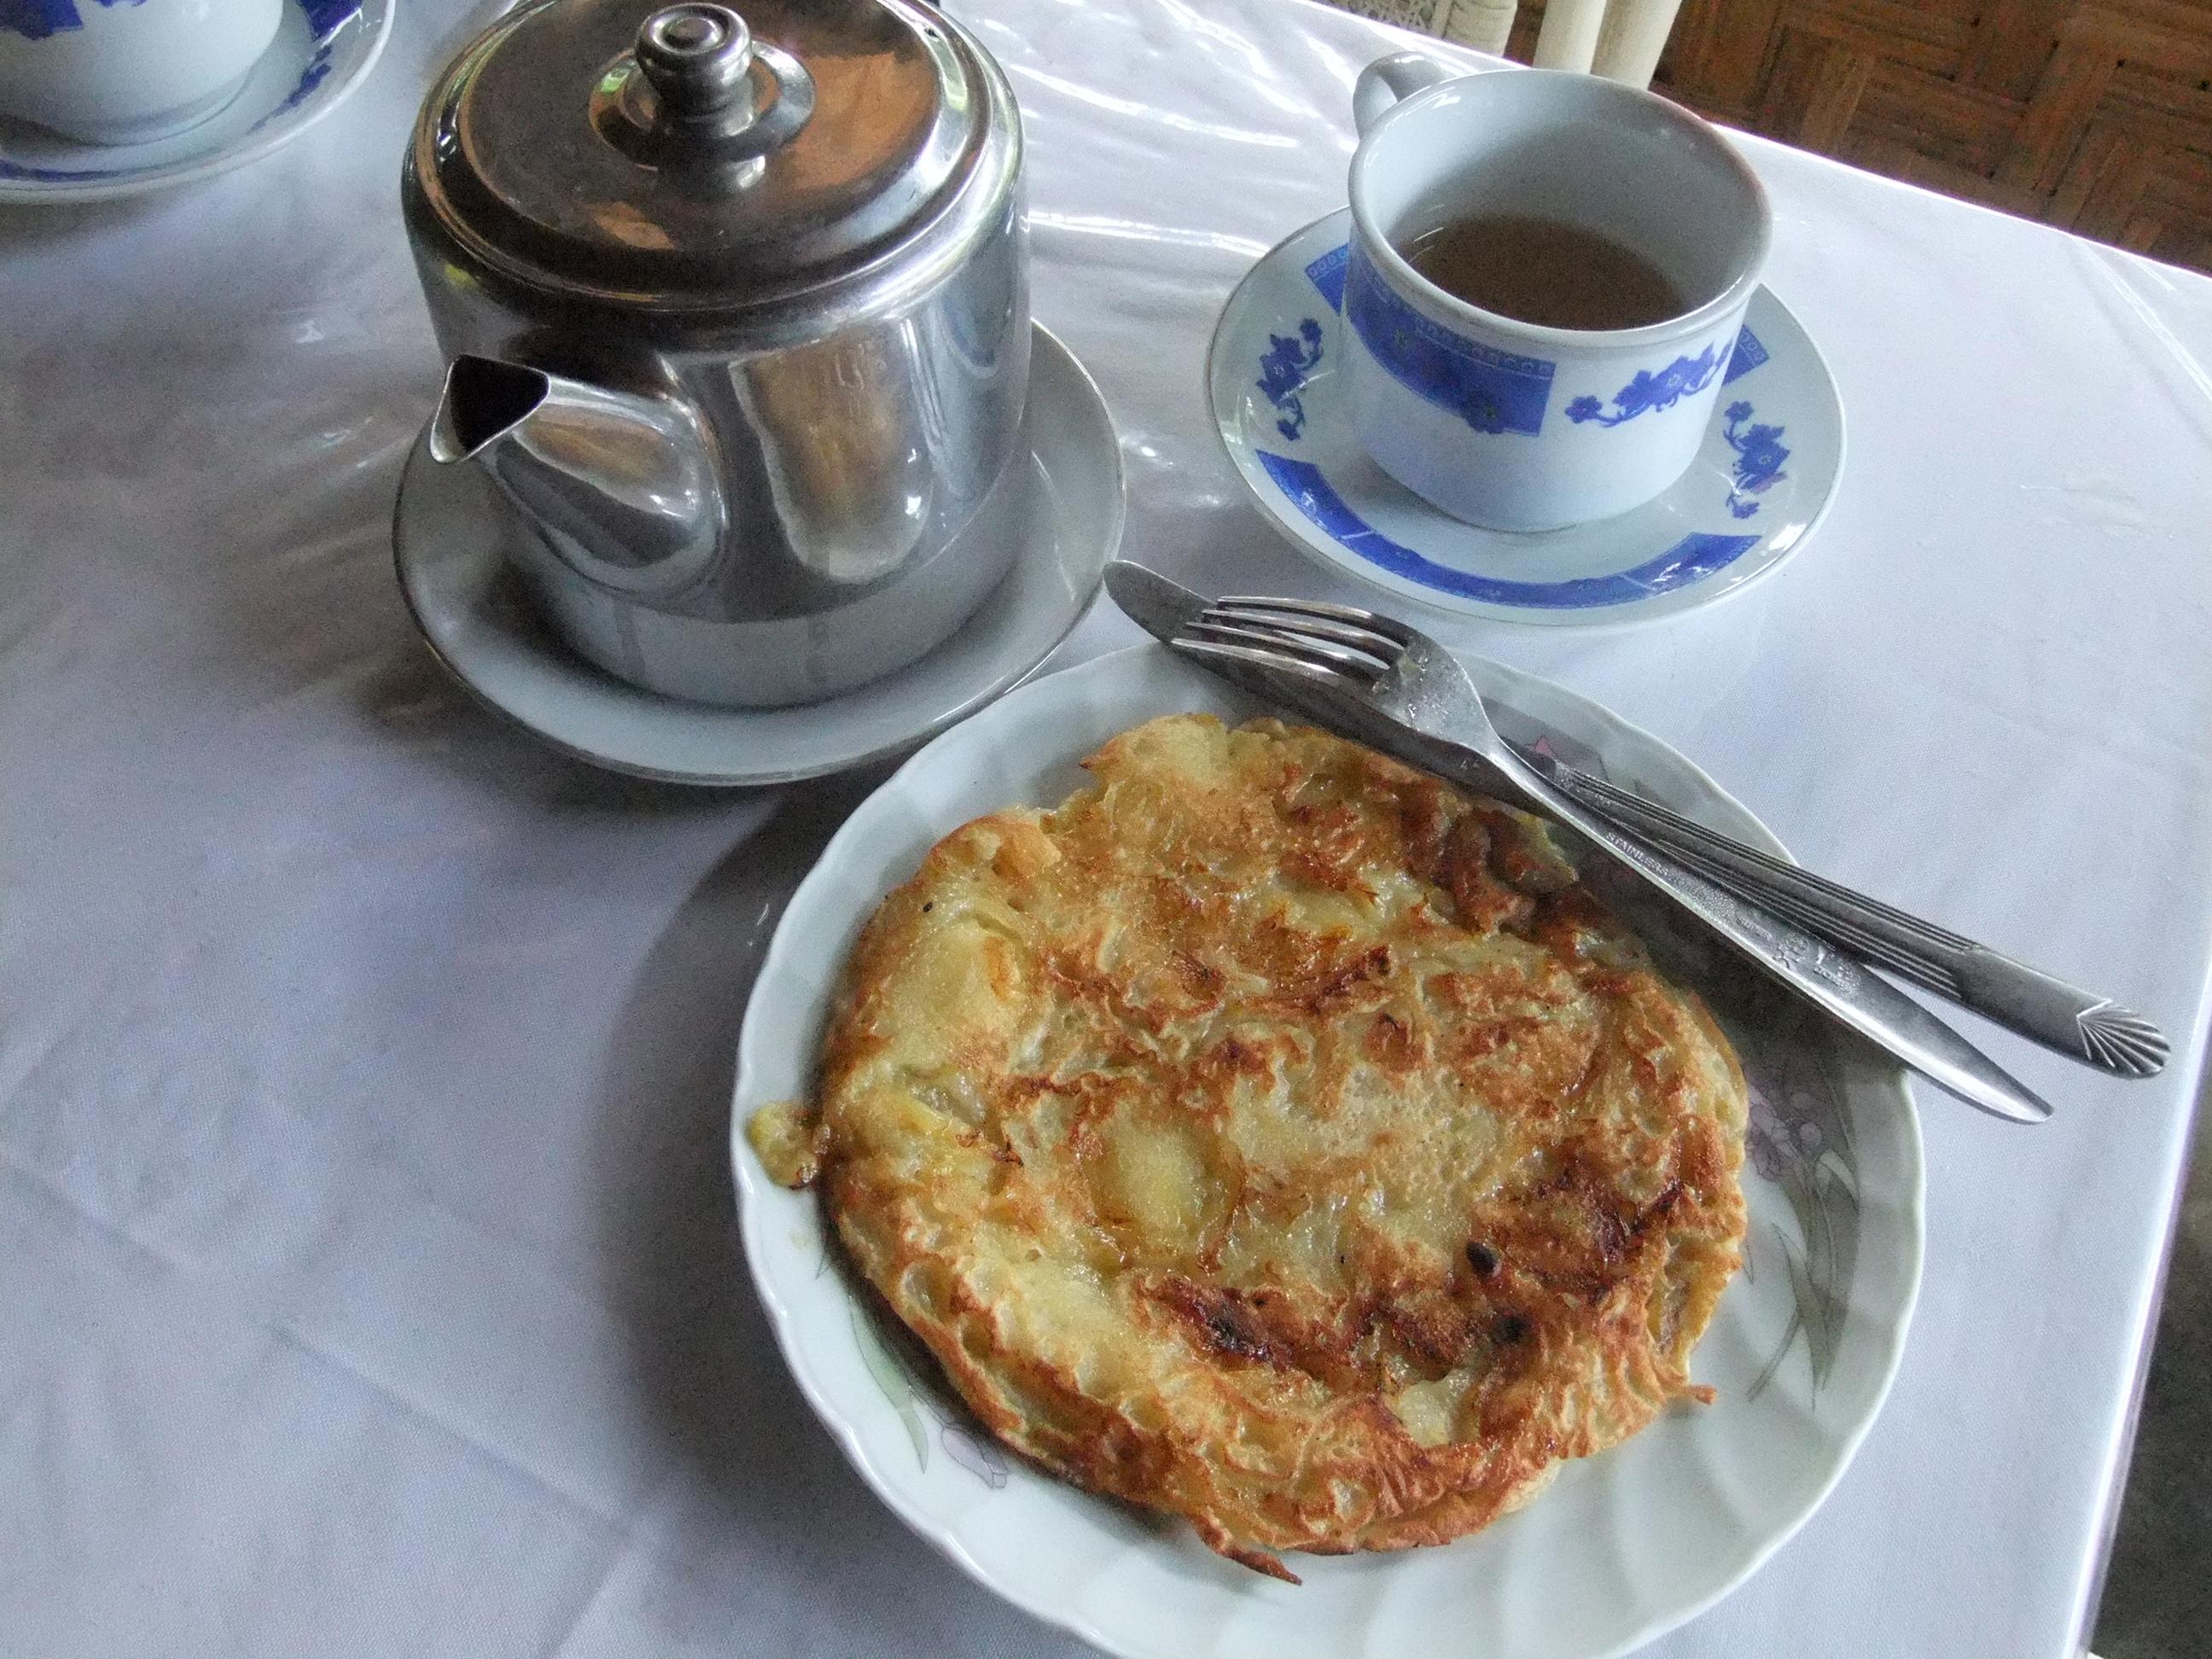 Banana_pancake_in_Rantepao_Toraja.JPG